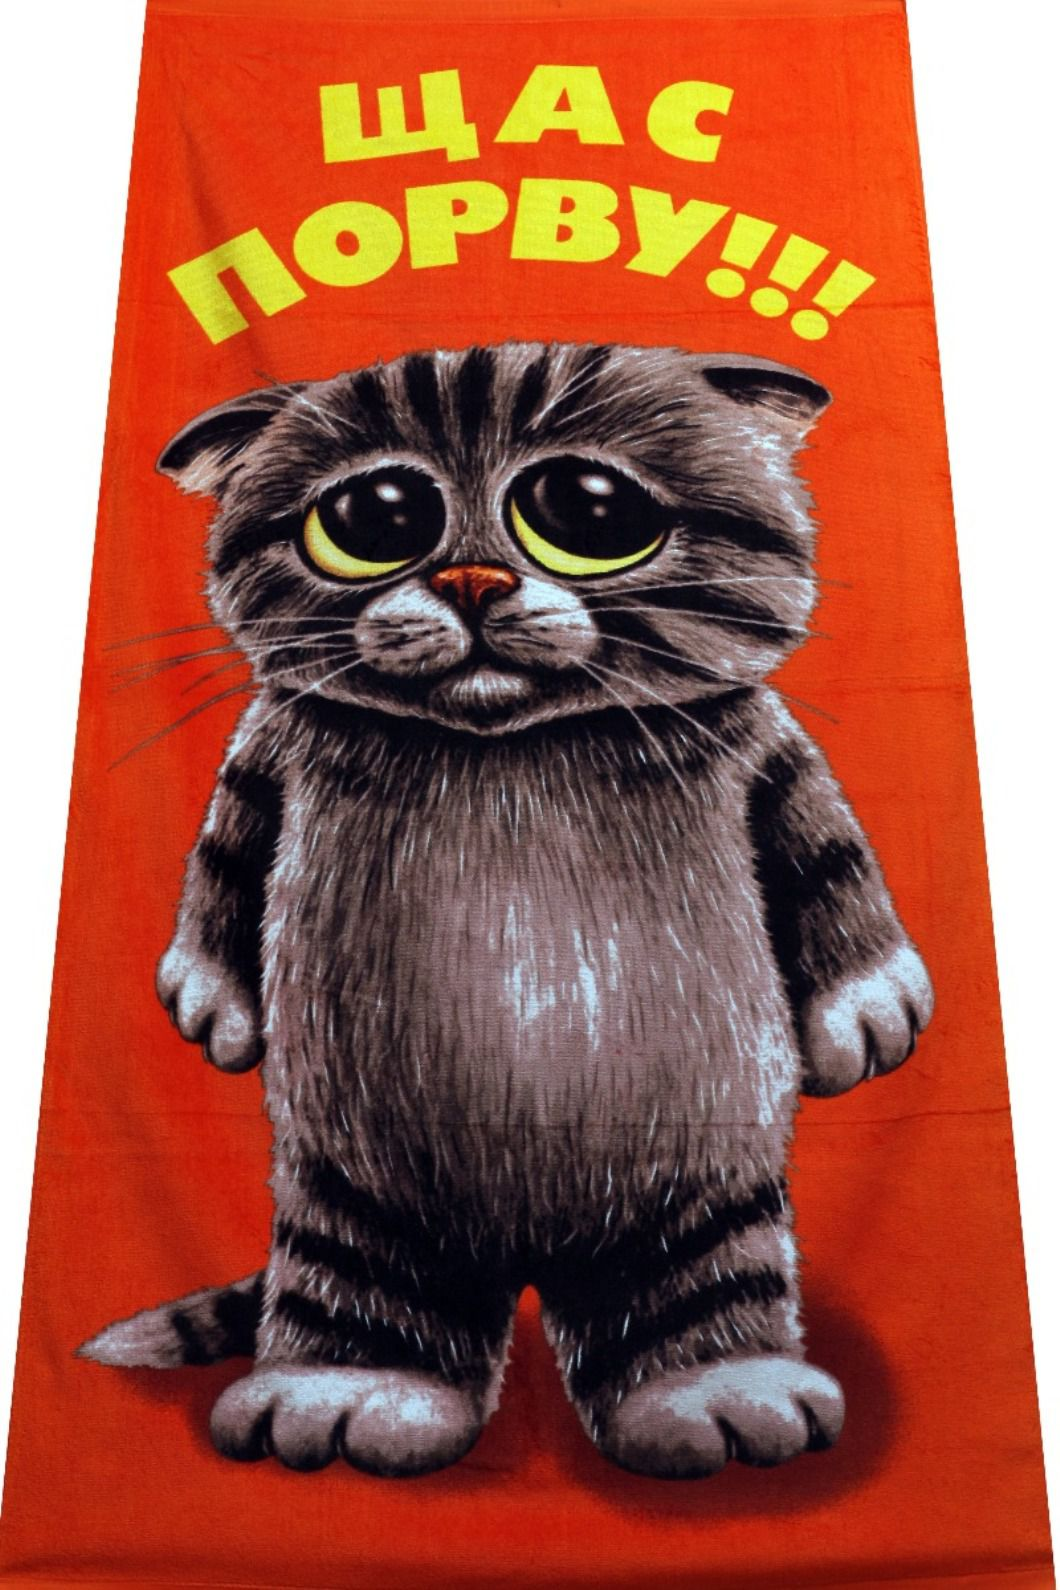 Полотенце с котенком «Щас порву»